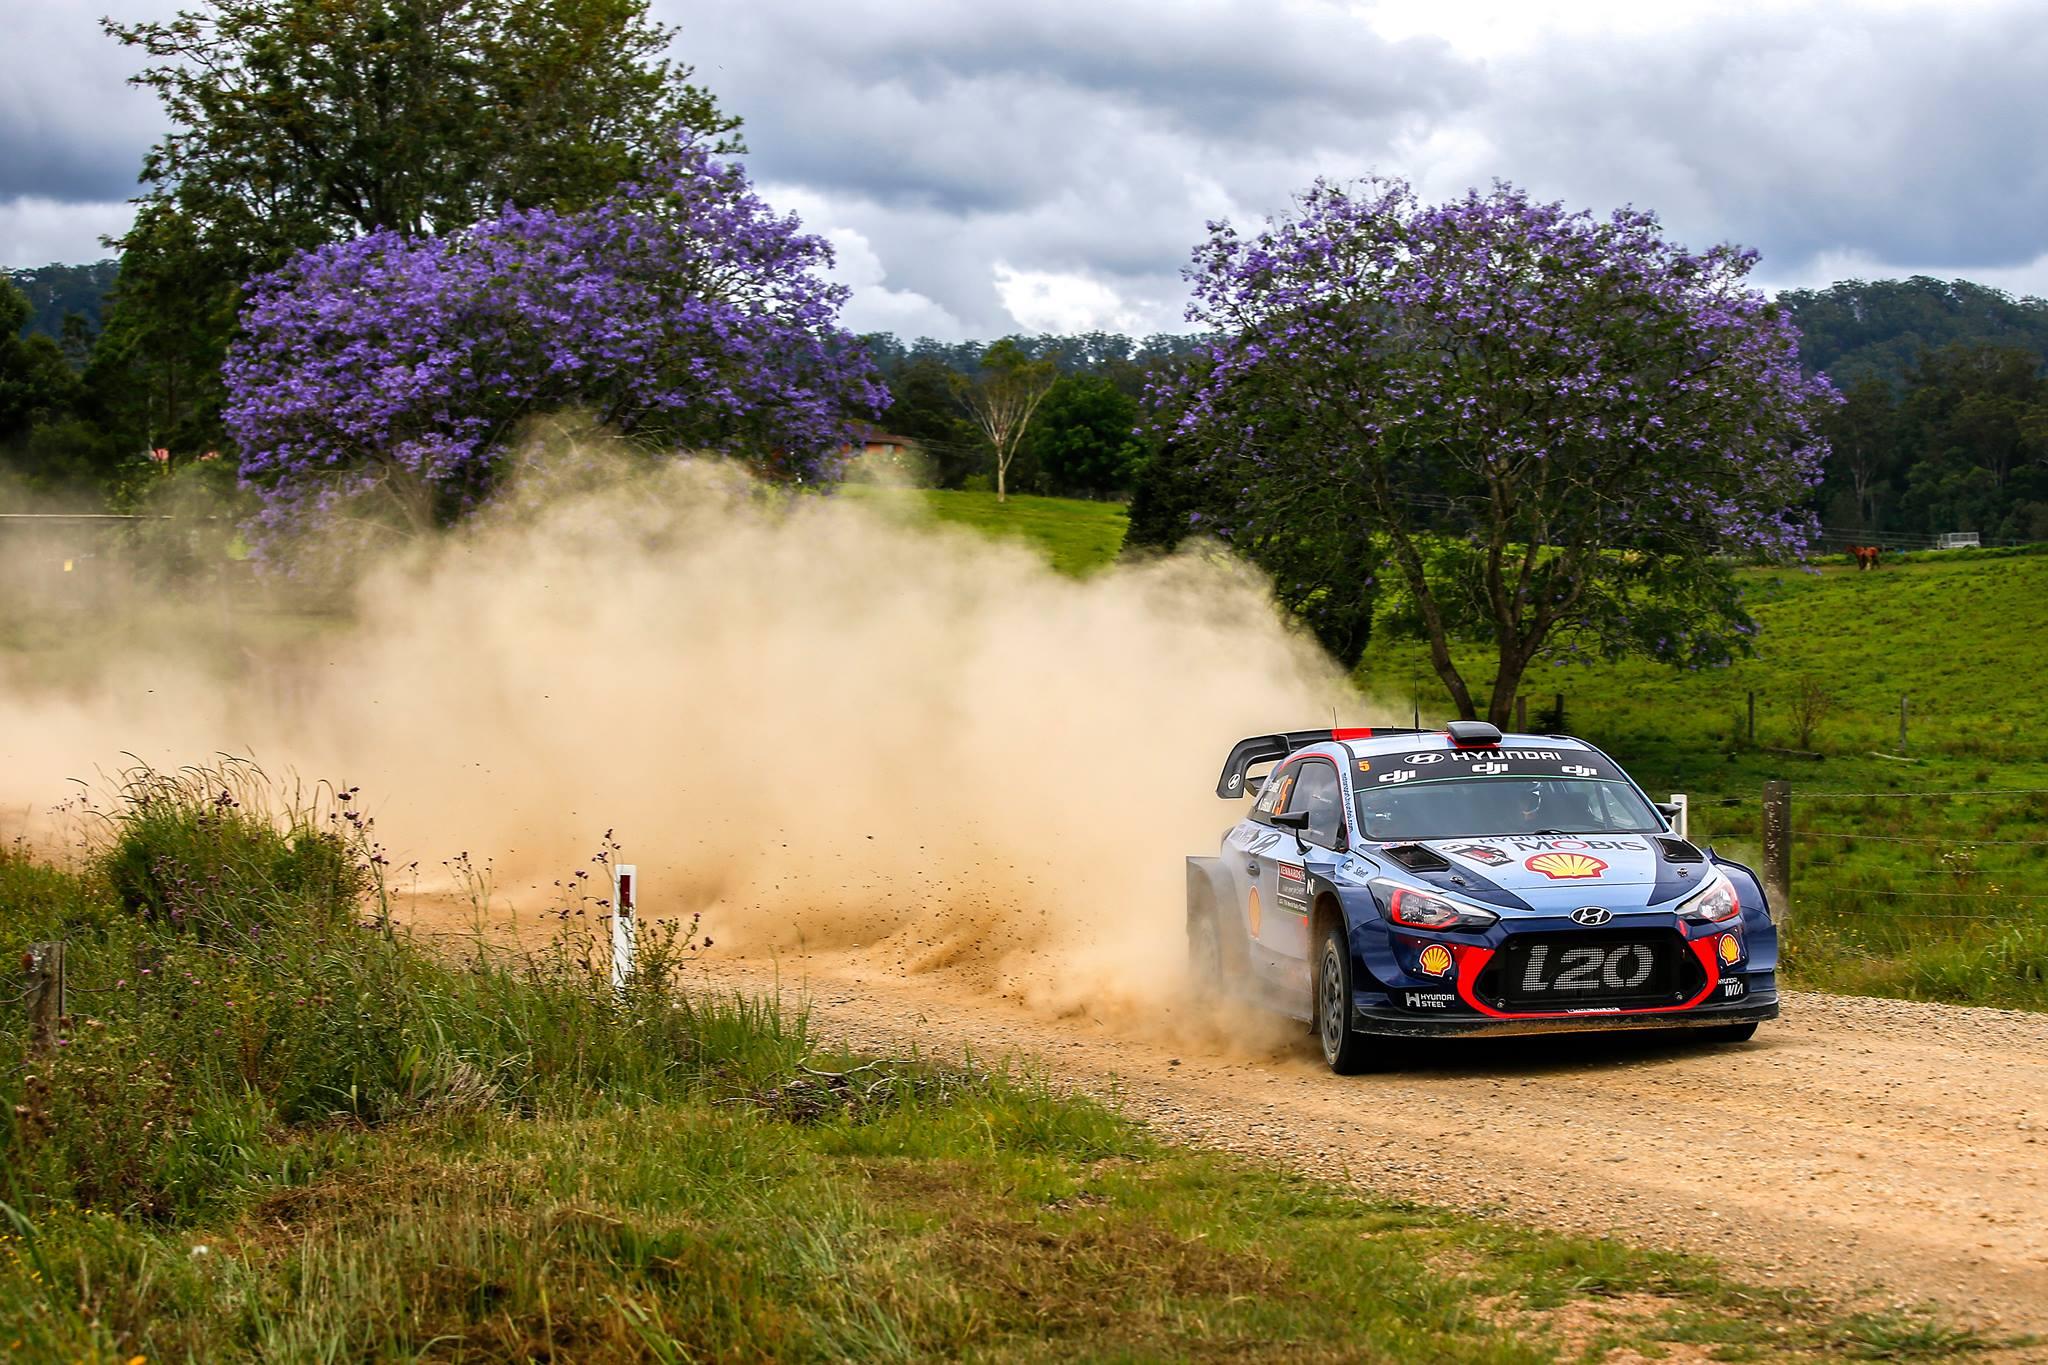 Hyundai remporte le Rallye d'Australie